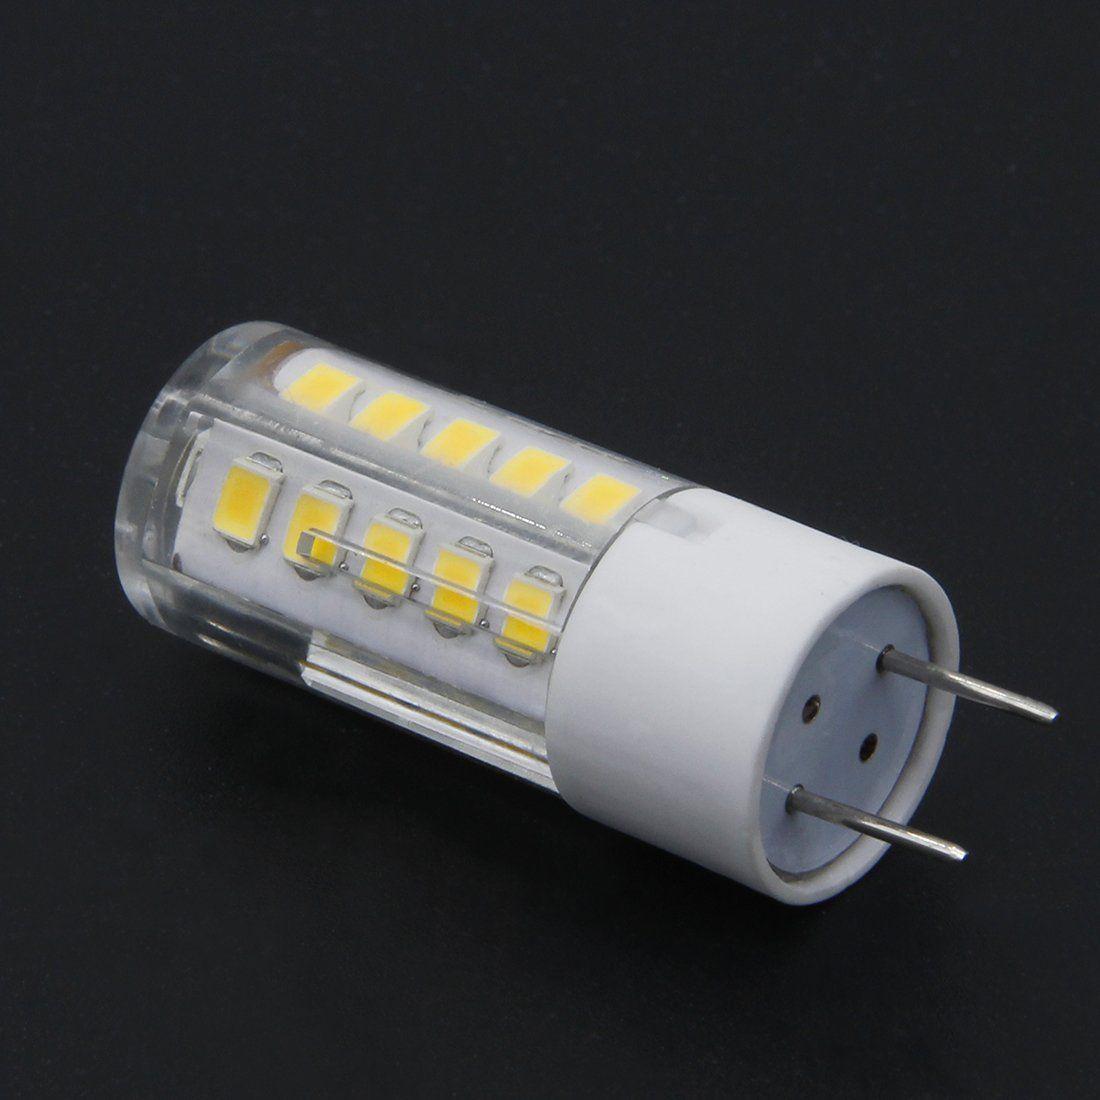 Bqhy 5pack G8 Led Bulb 120v T4 G8 Base Bipin Xenon Jcd Type Led Halogen Replacement Bulb 25w Equivalent Warm White 3000k Check Out T Light Bulb Bulb Led